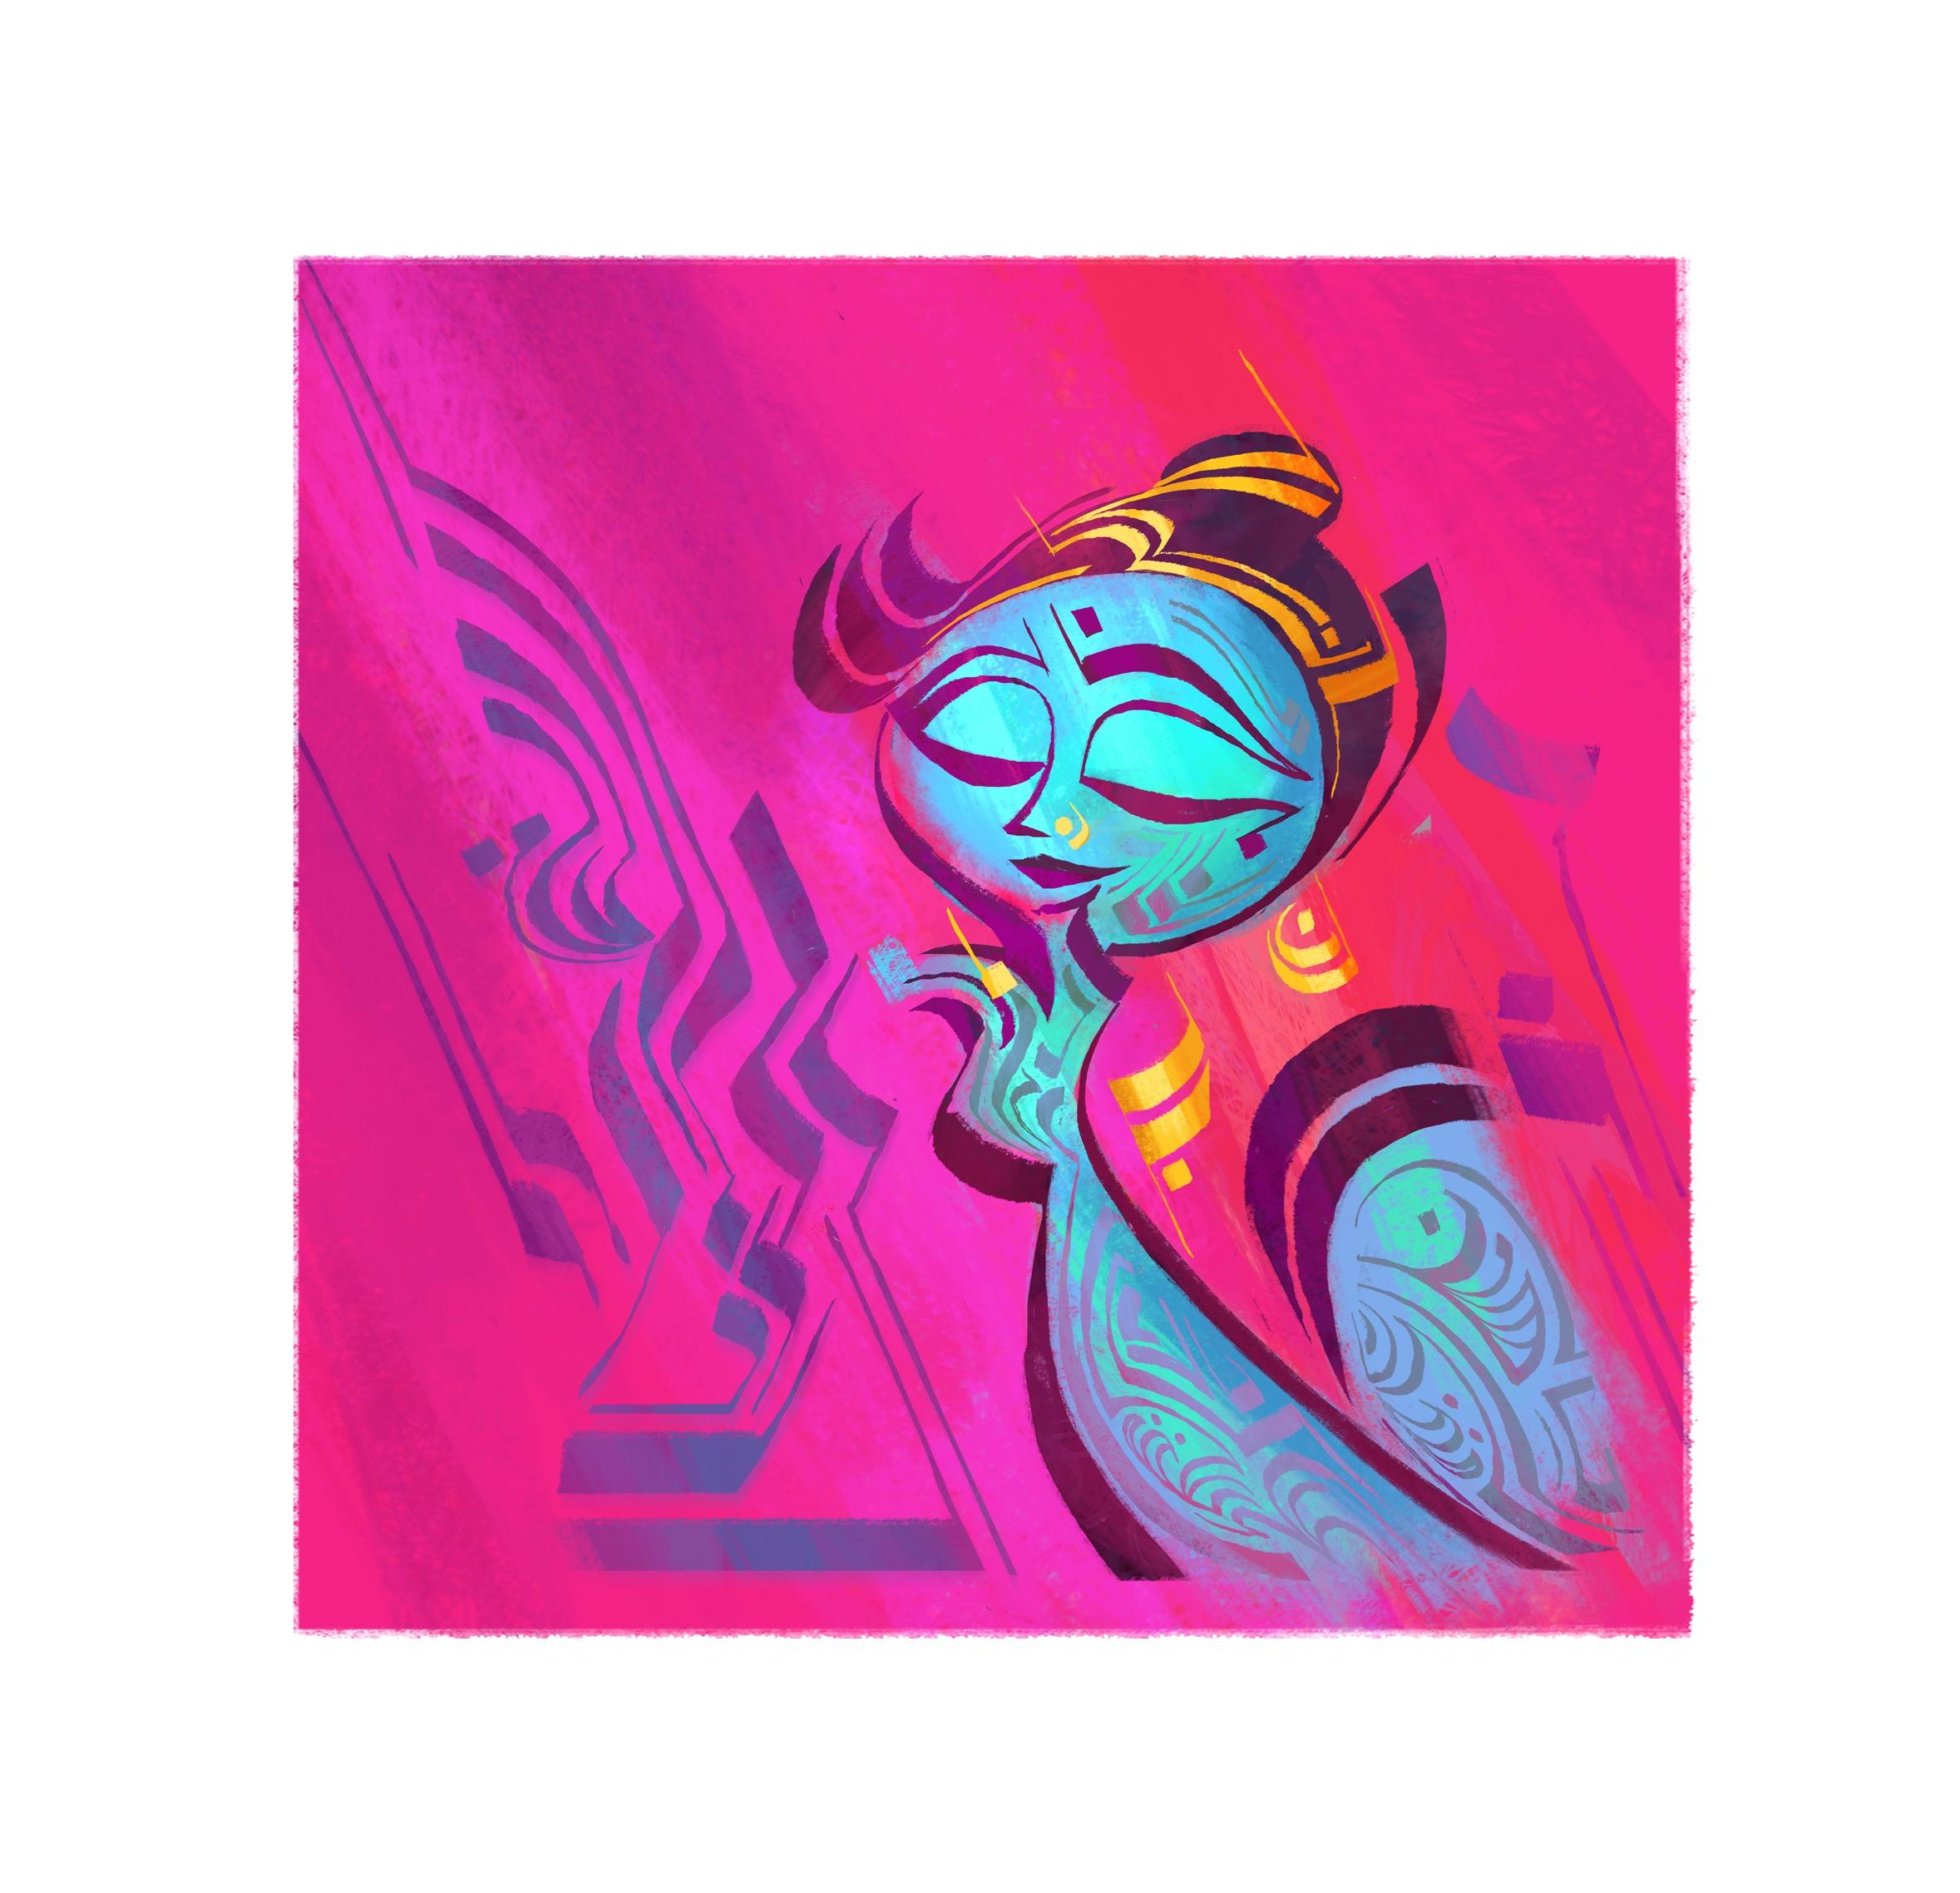 Indian Dancer 04, 8 x 8